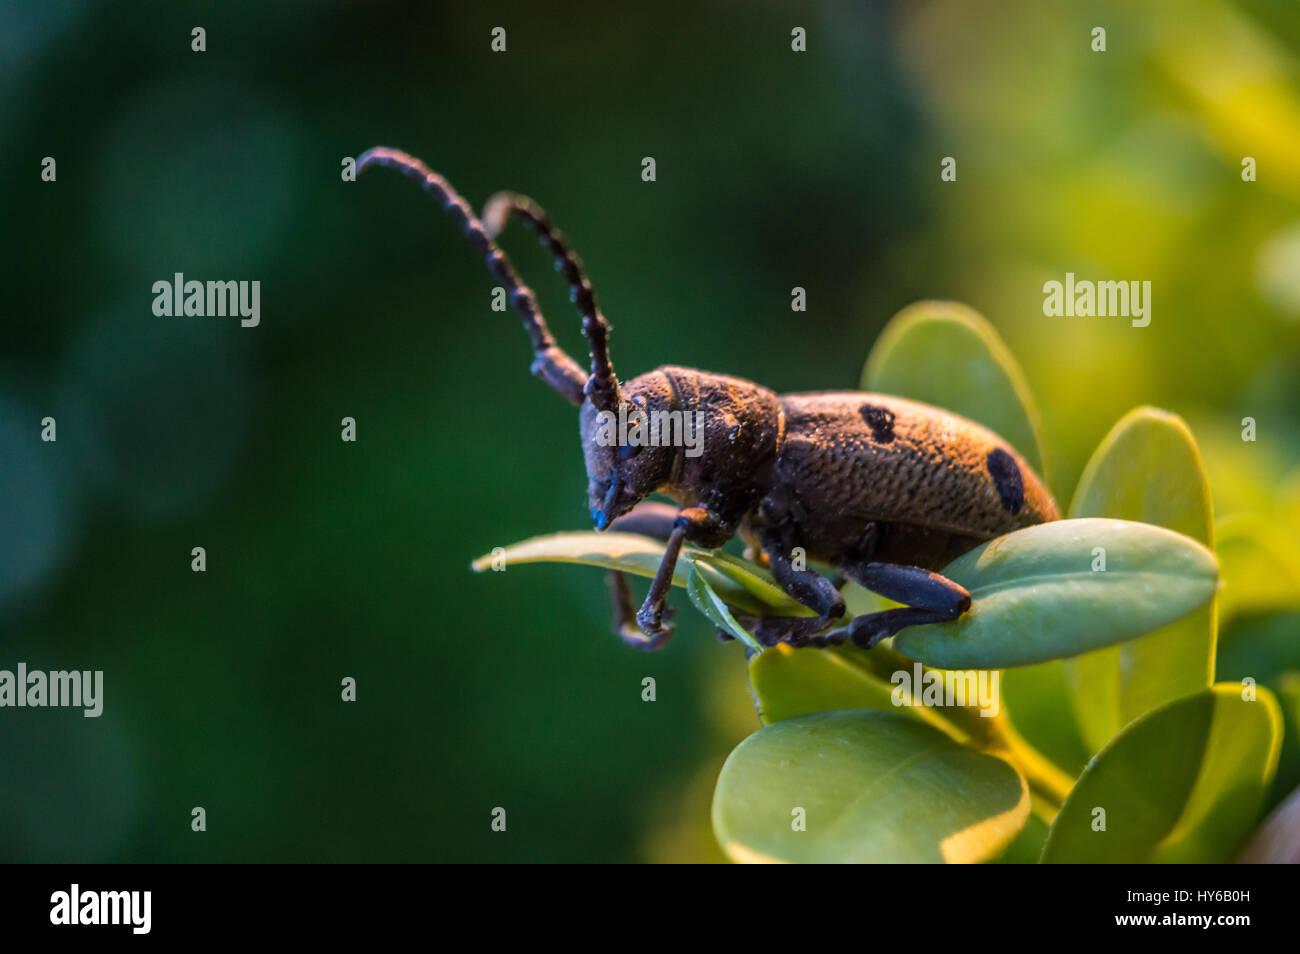 Käfer auf Blatt Makro erschossen in der Farbe braun. Stockbild